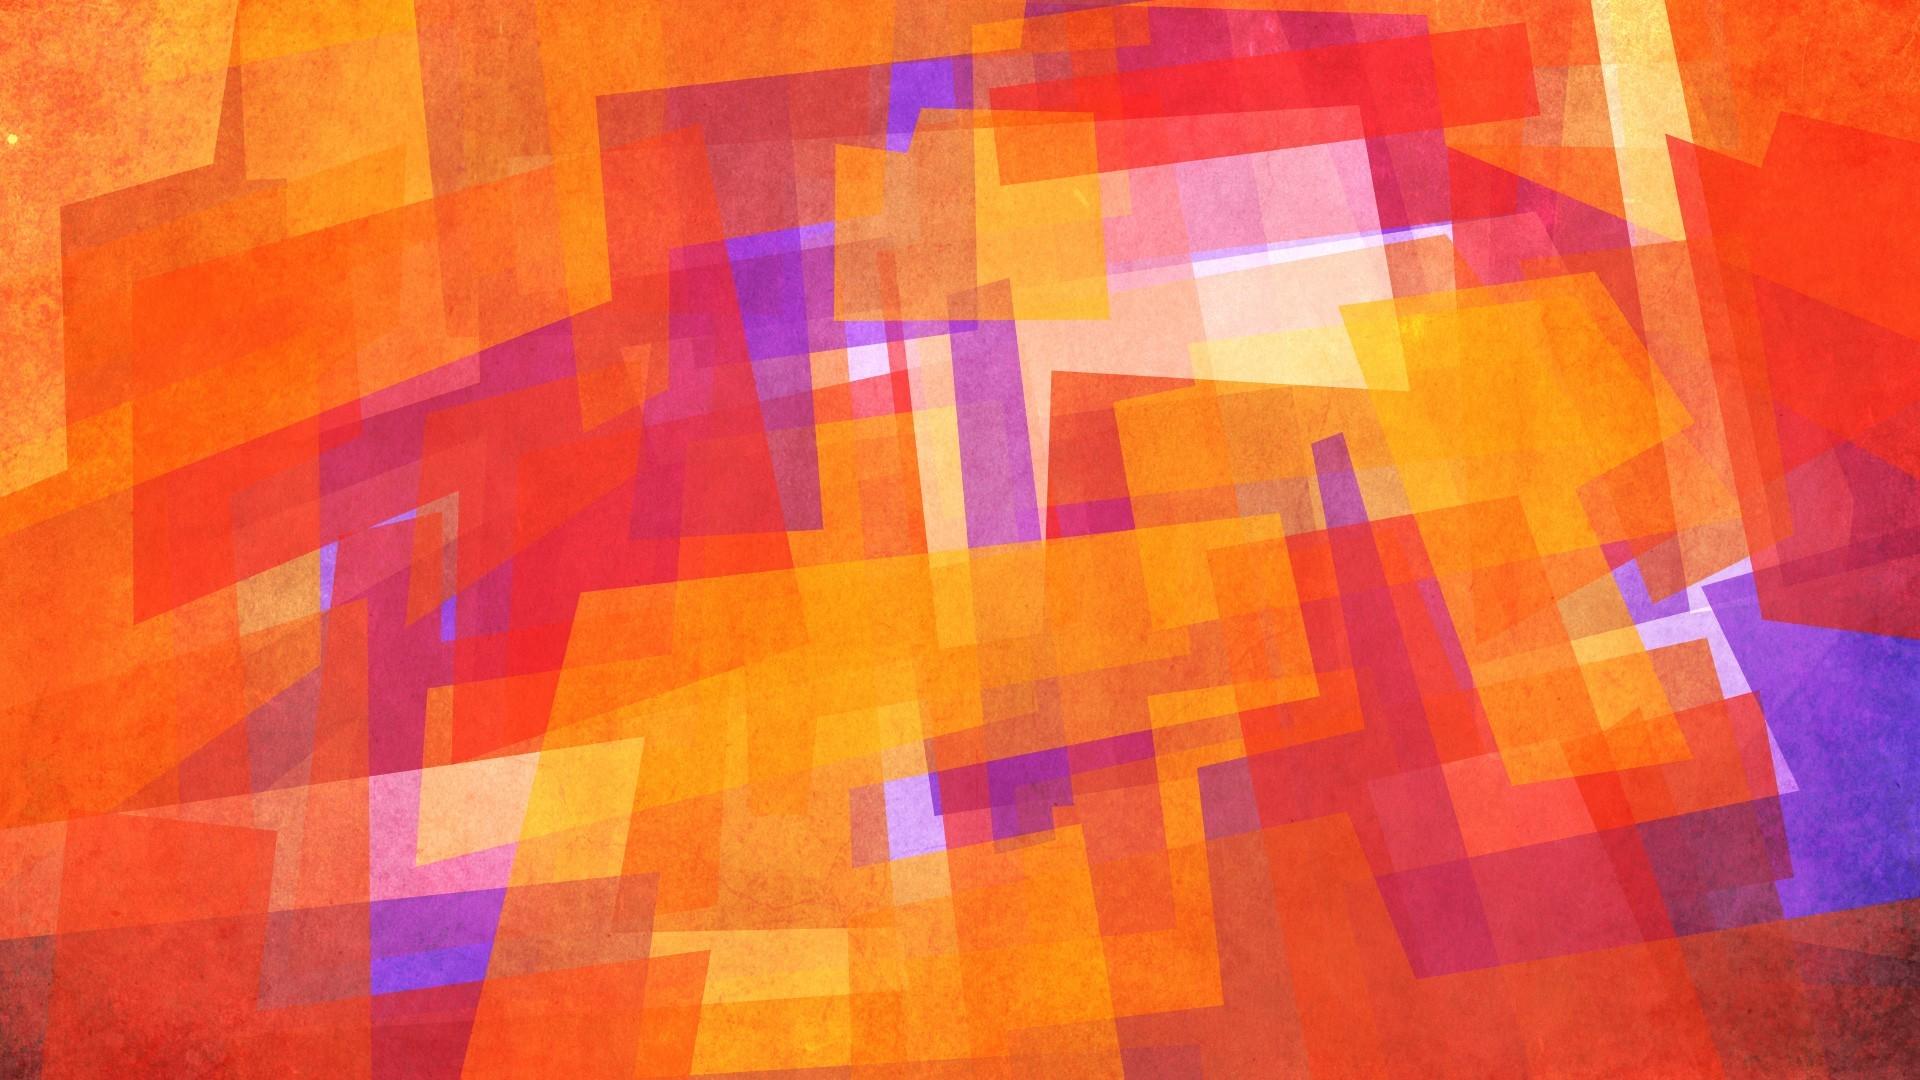 Orange Full HD Wallpaper